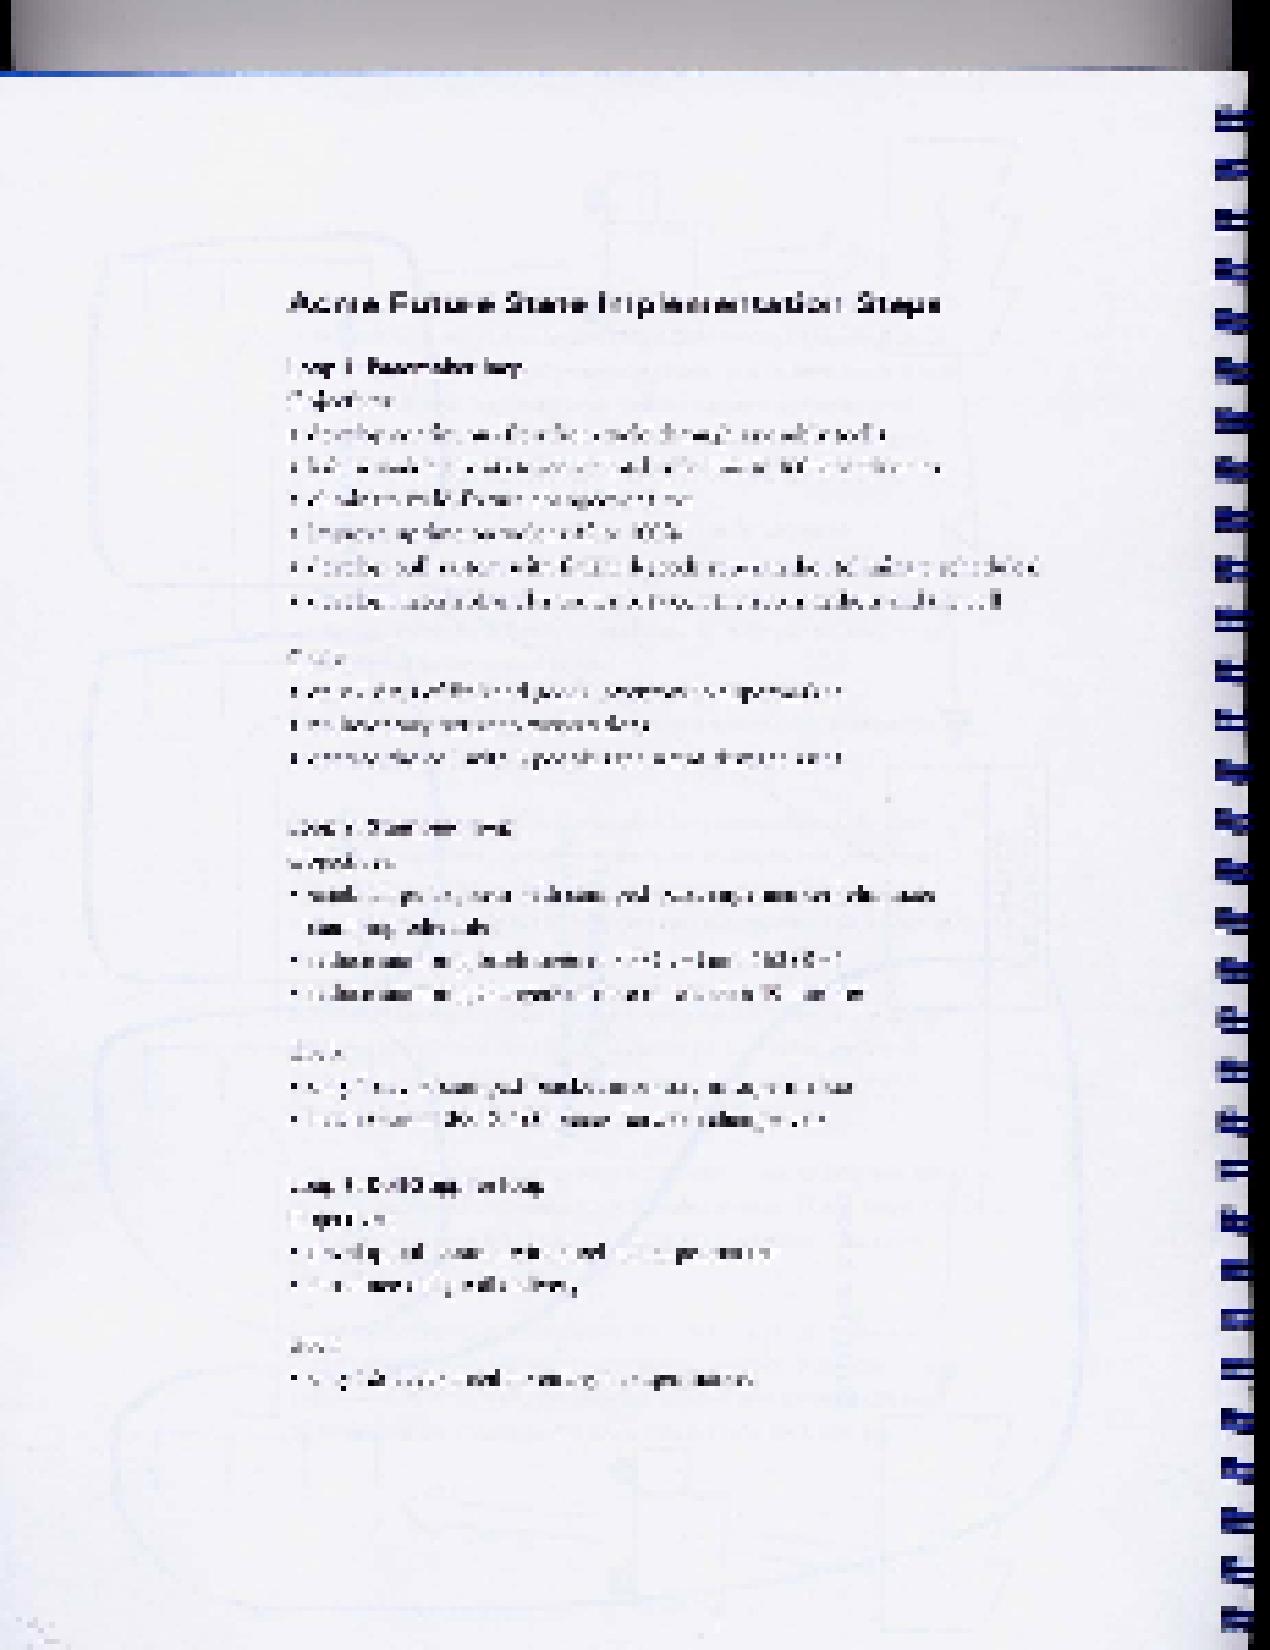 baba 1001 ac universal remote manual